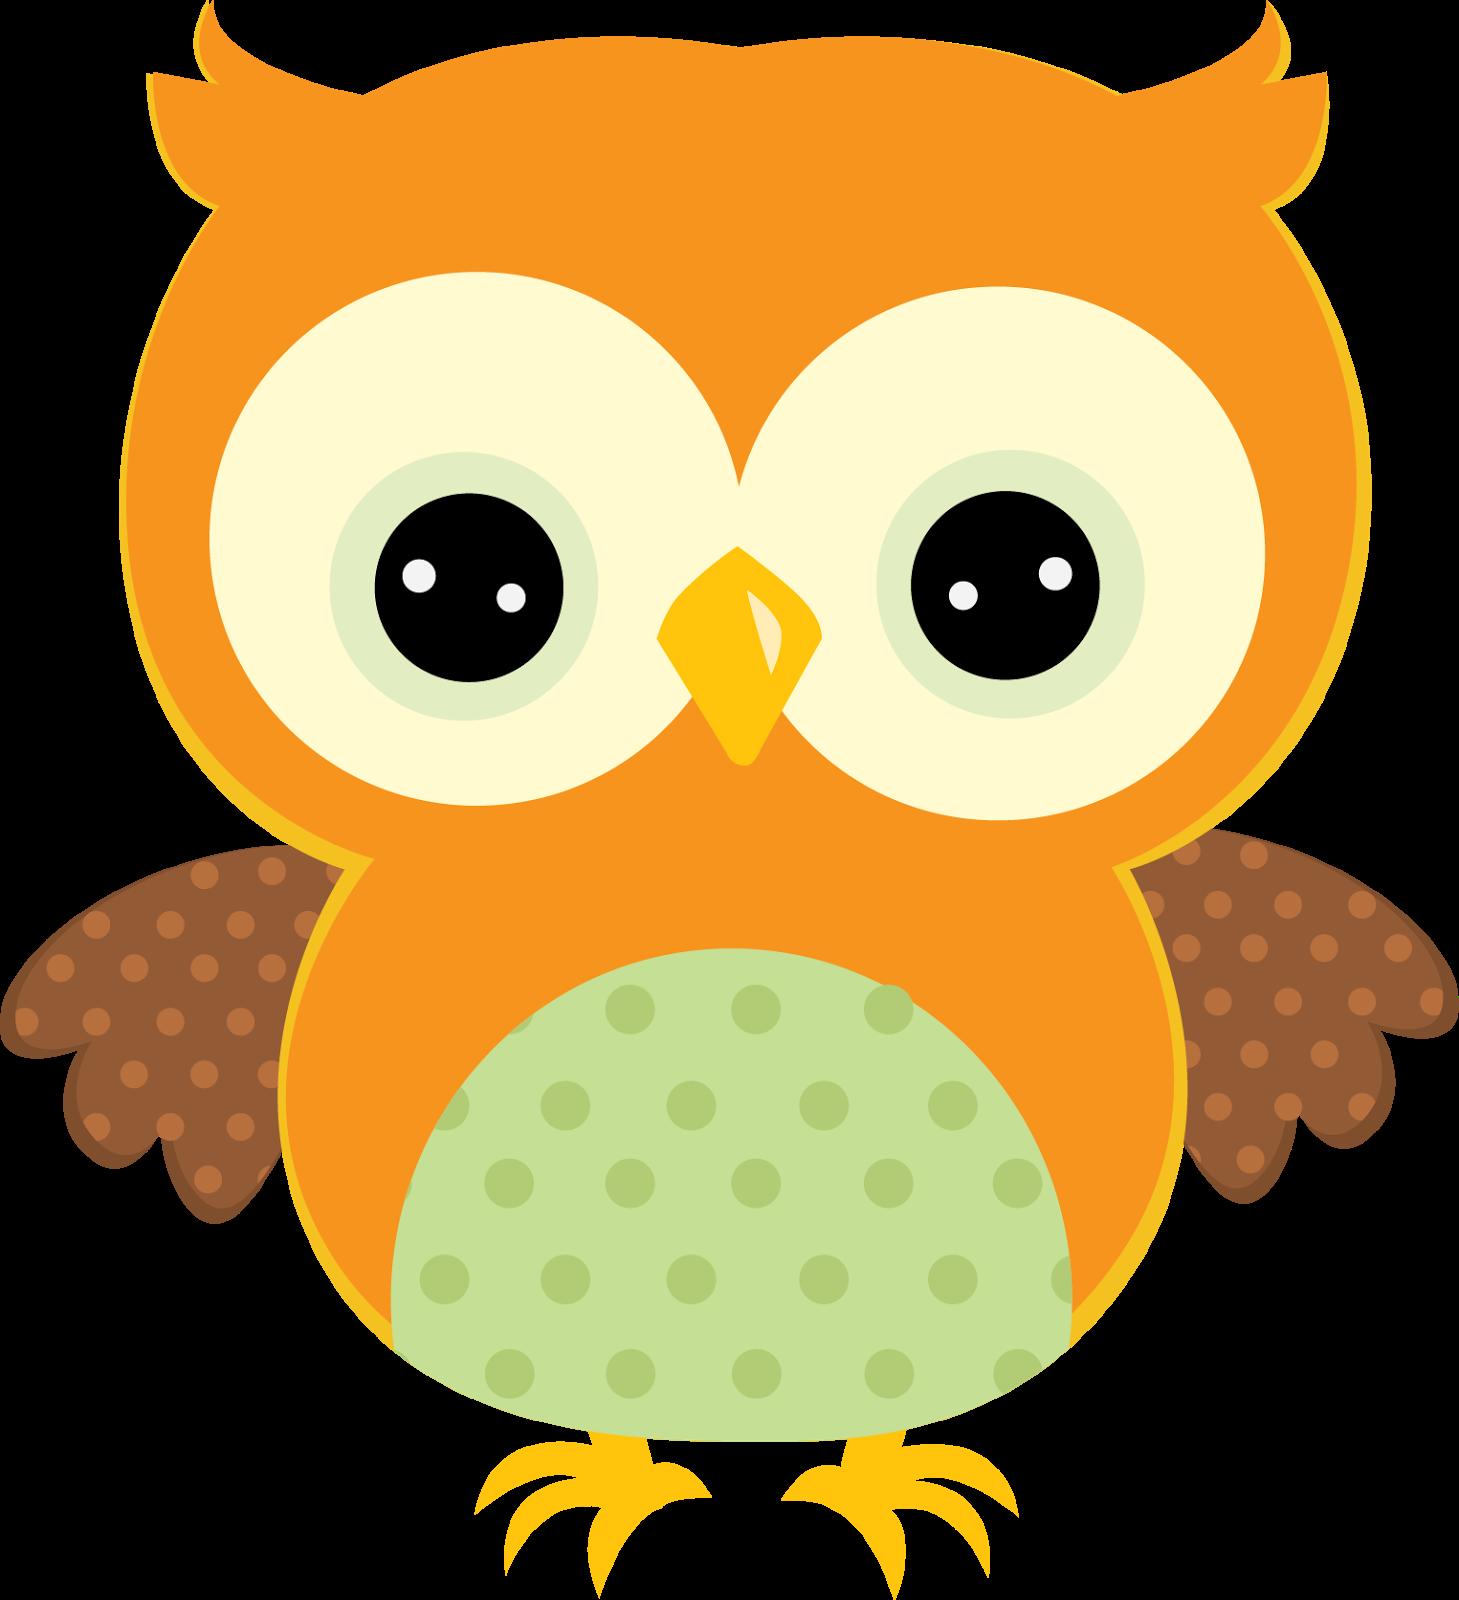 graphic royalty free Owls clipart. Sgblogosfera mar a jos.